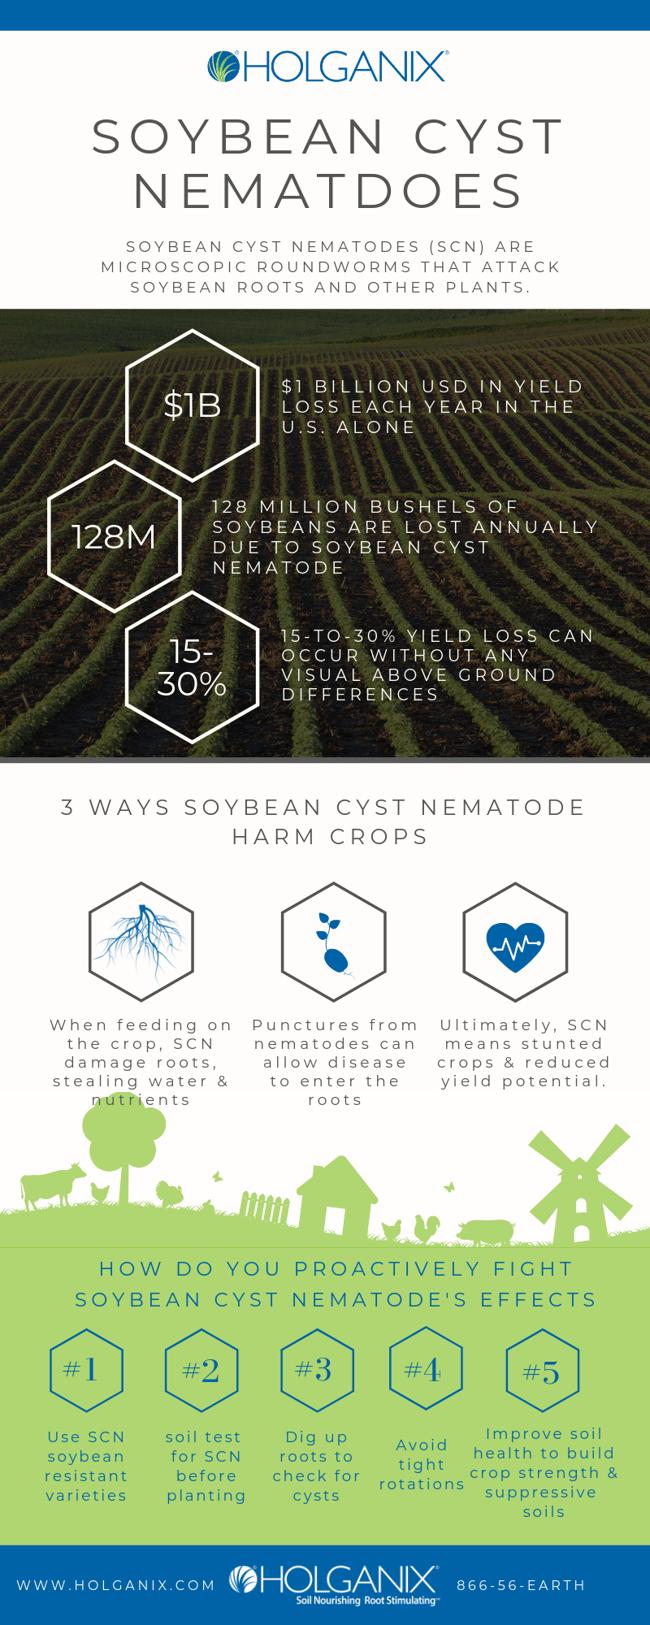 Soybean cyst nematode infographic